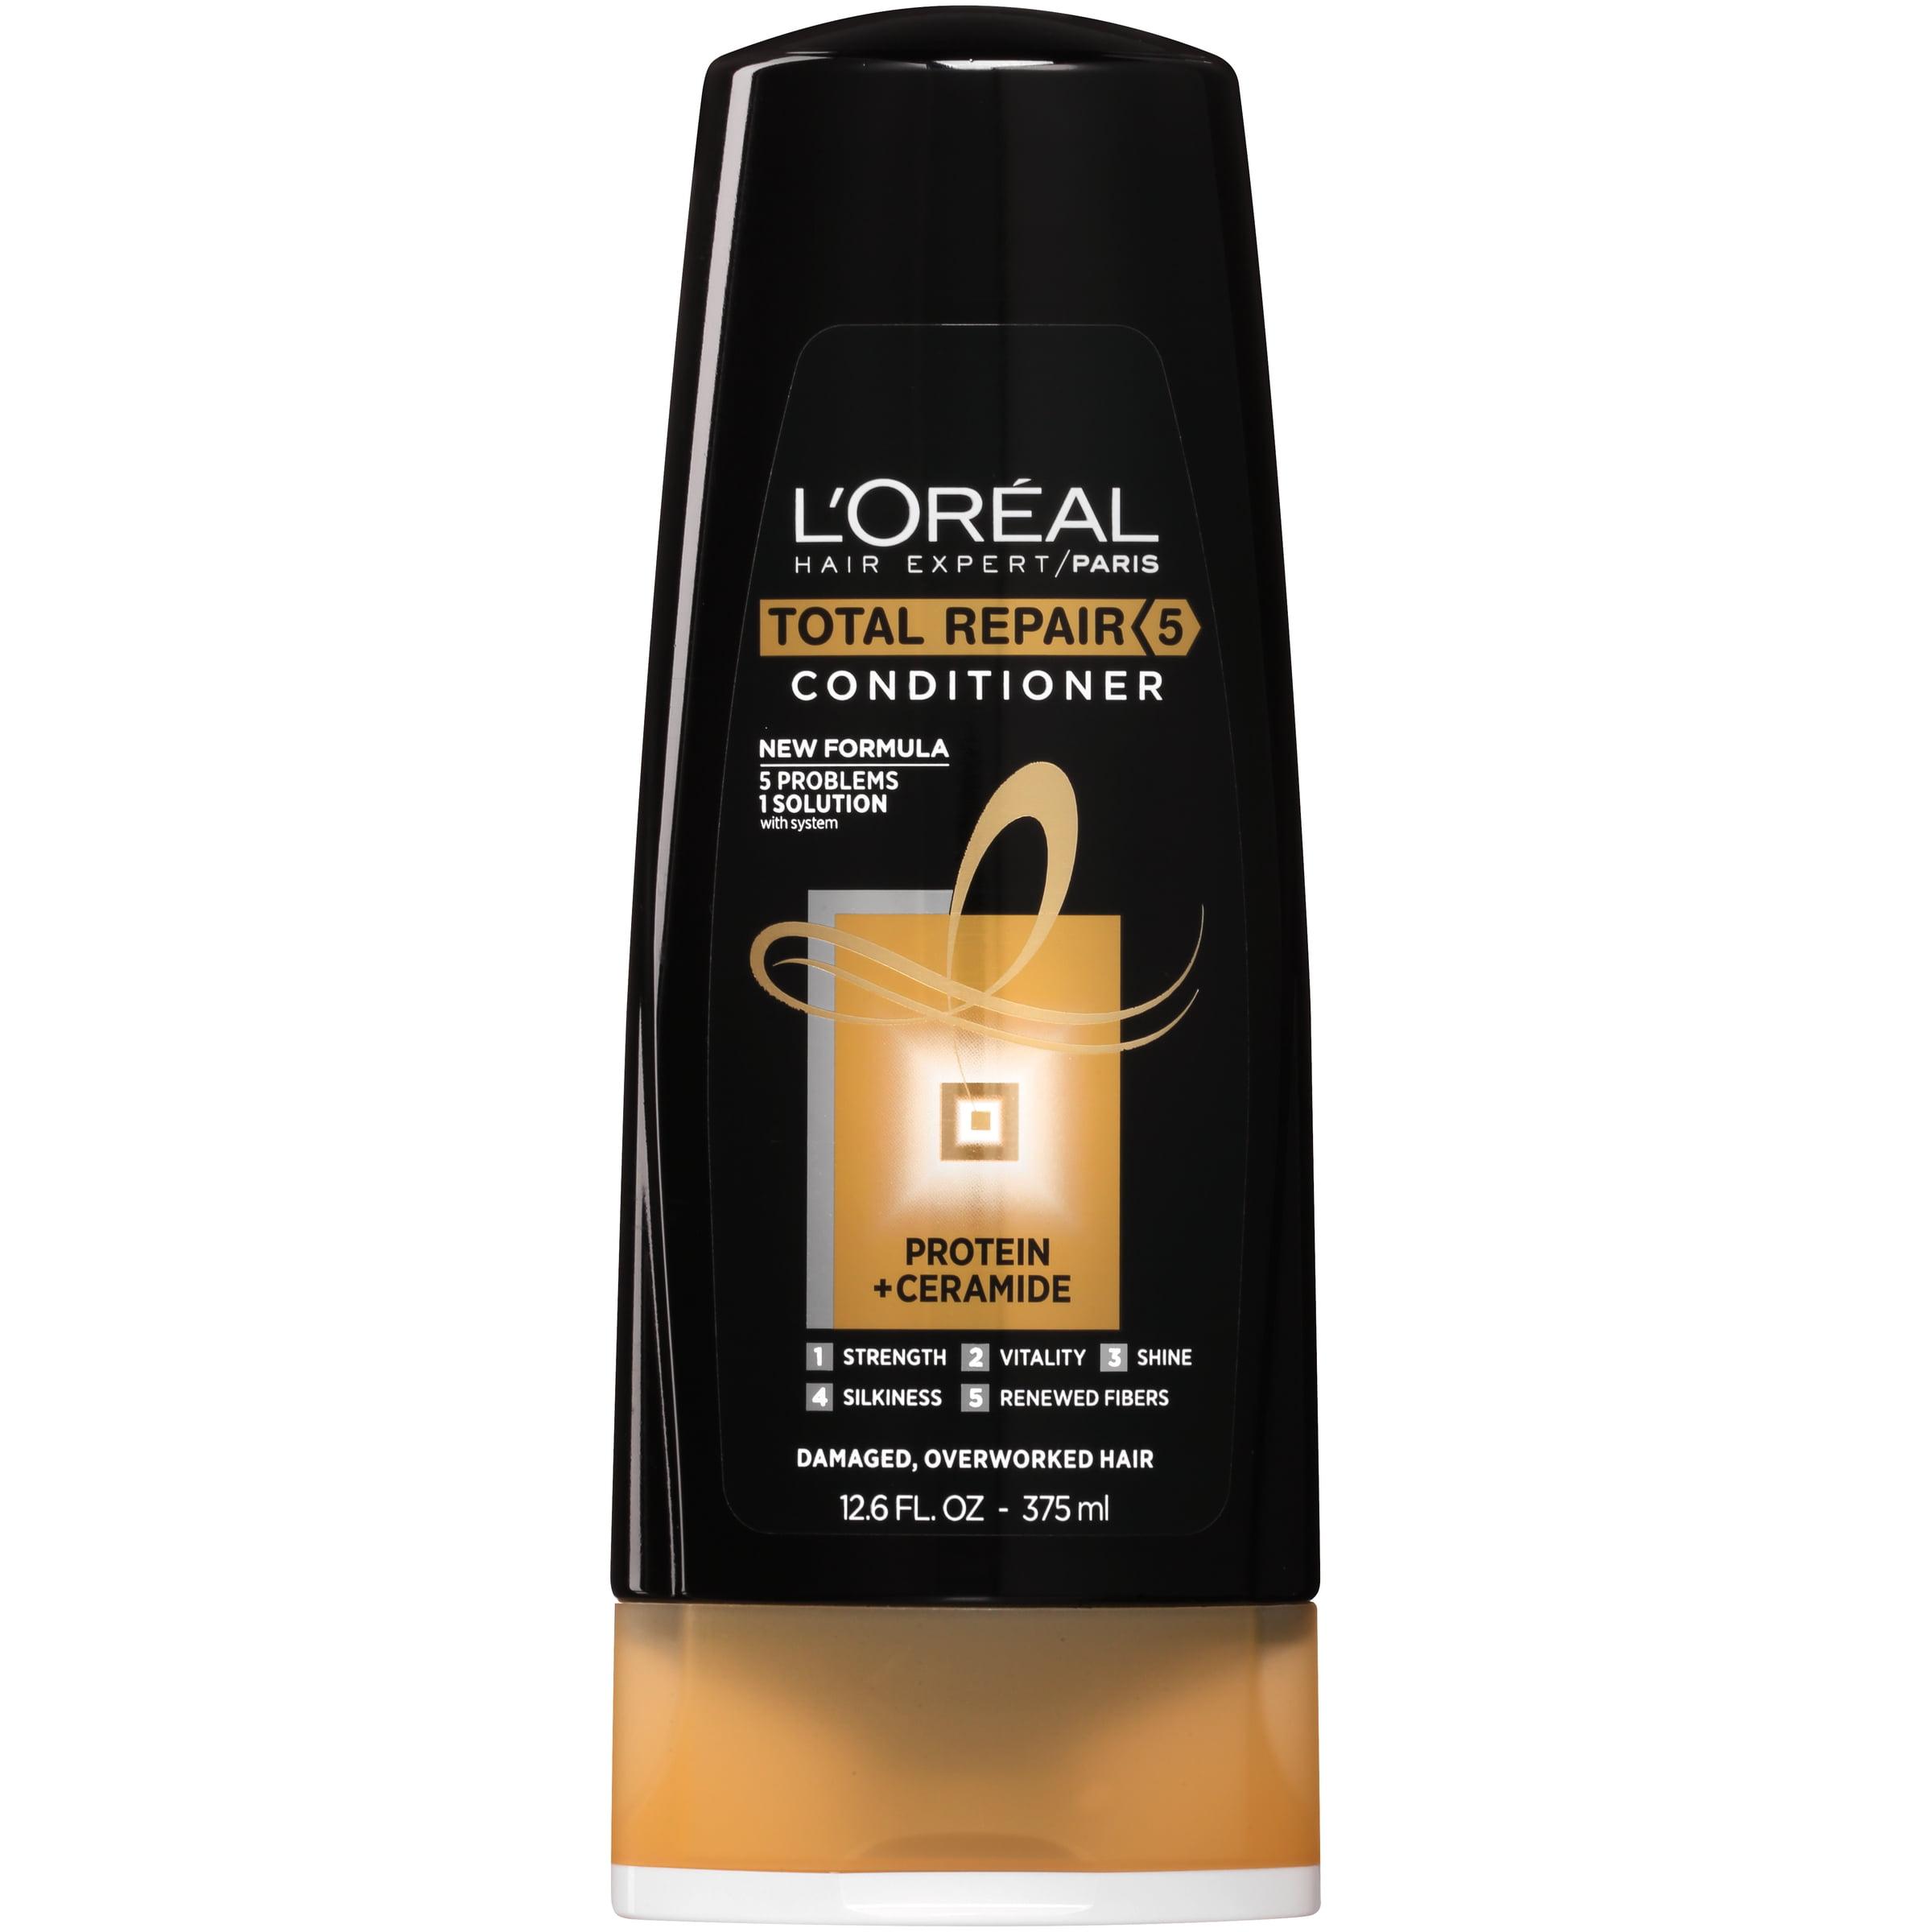 L'Oreal Paris Hair Expert Total Repair 5 Conditioner 12.6 fl. oz. Bottle